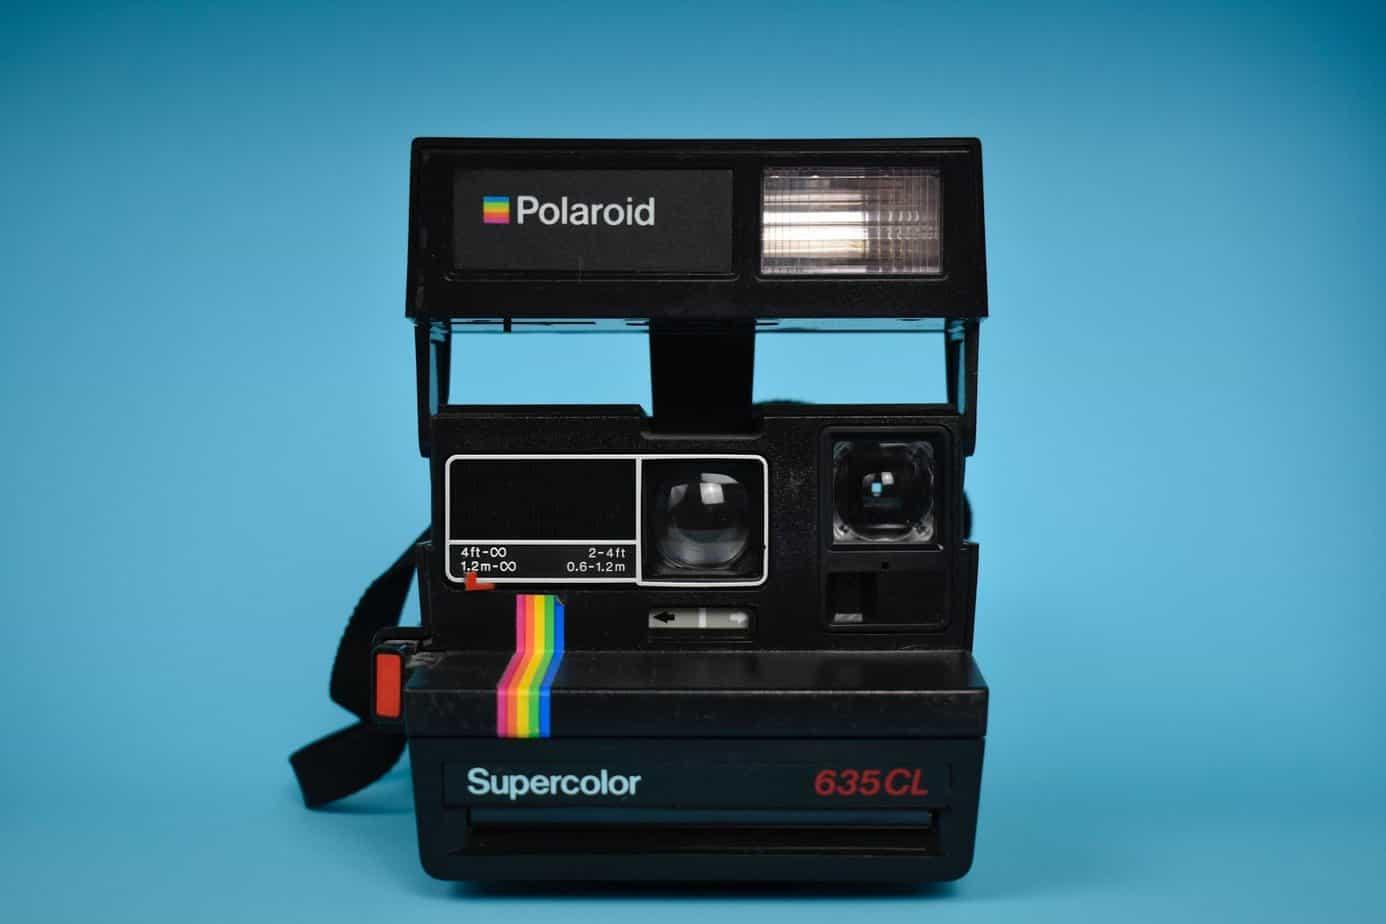 Early Digital Cameras